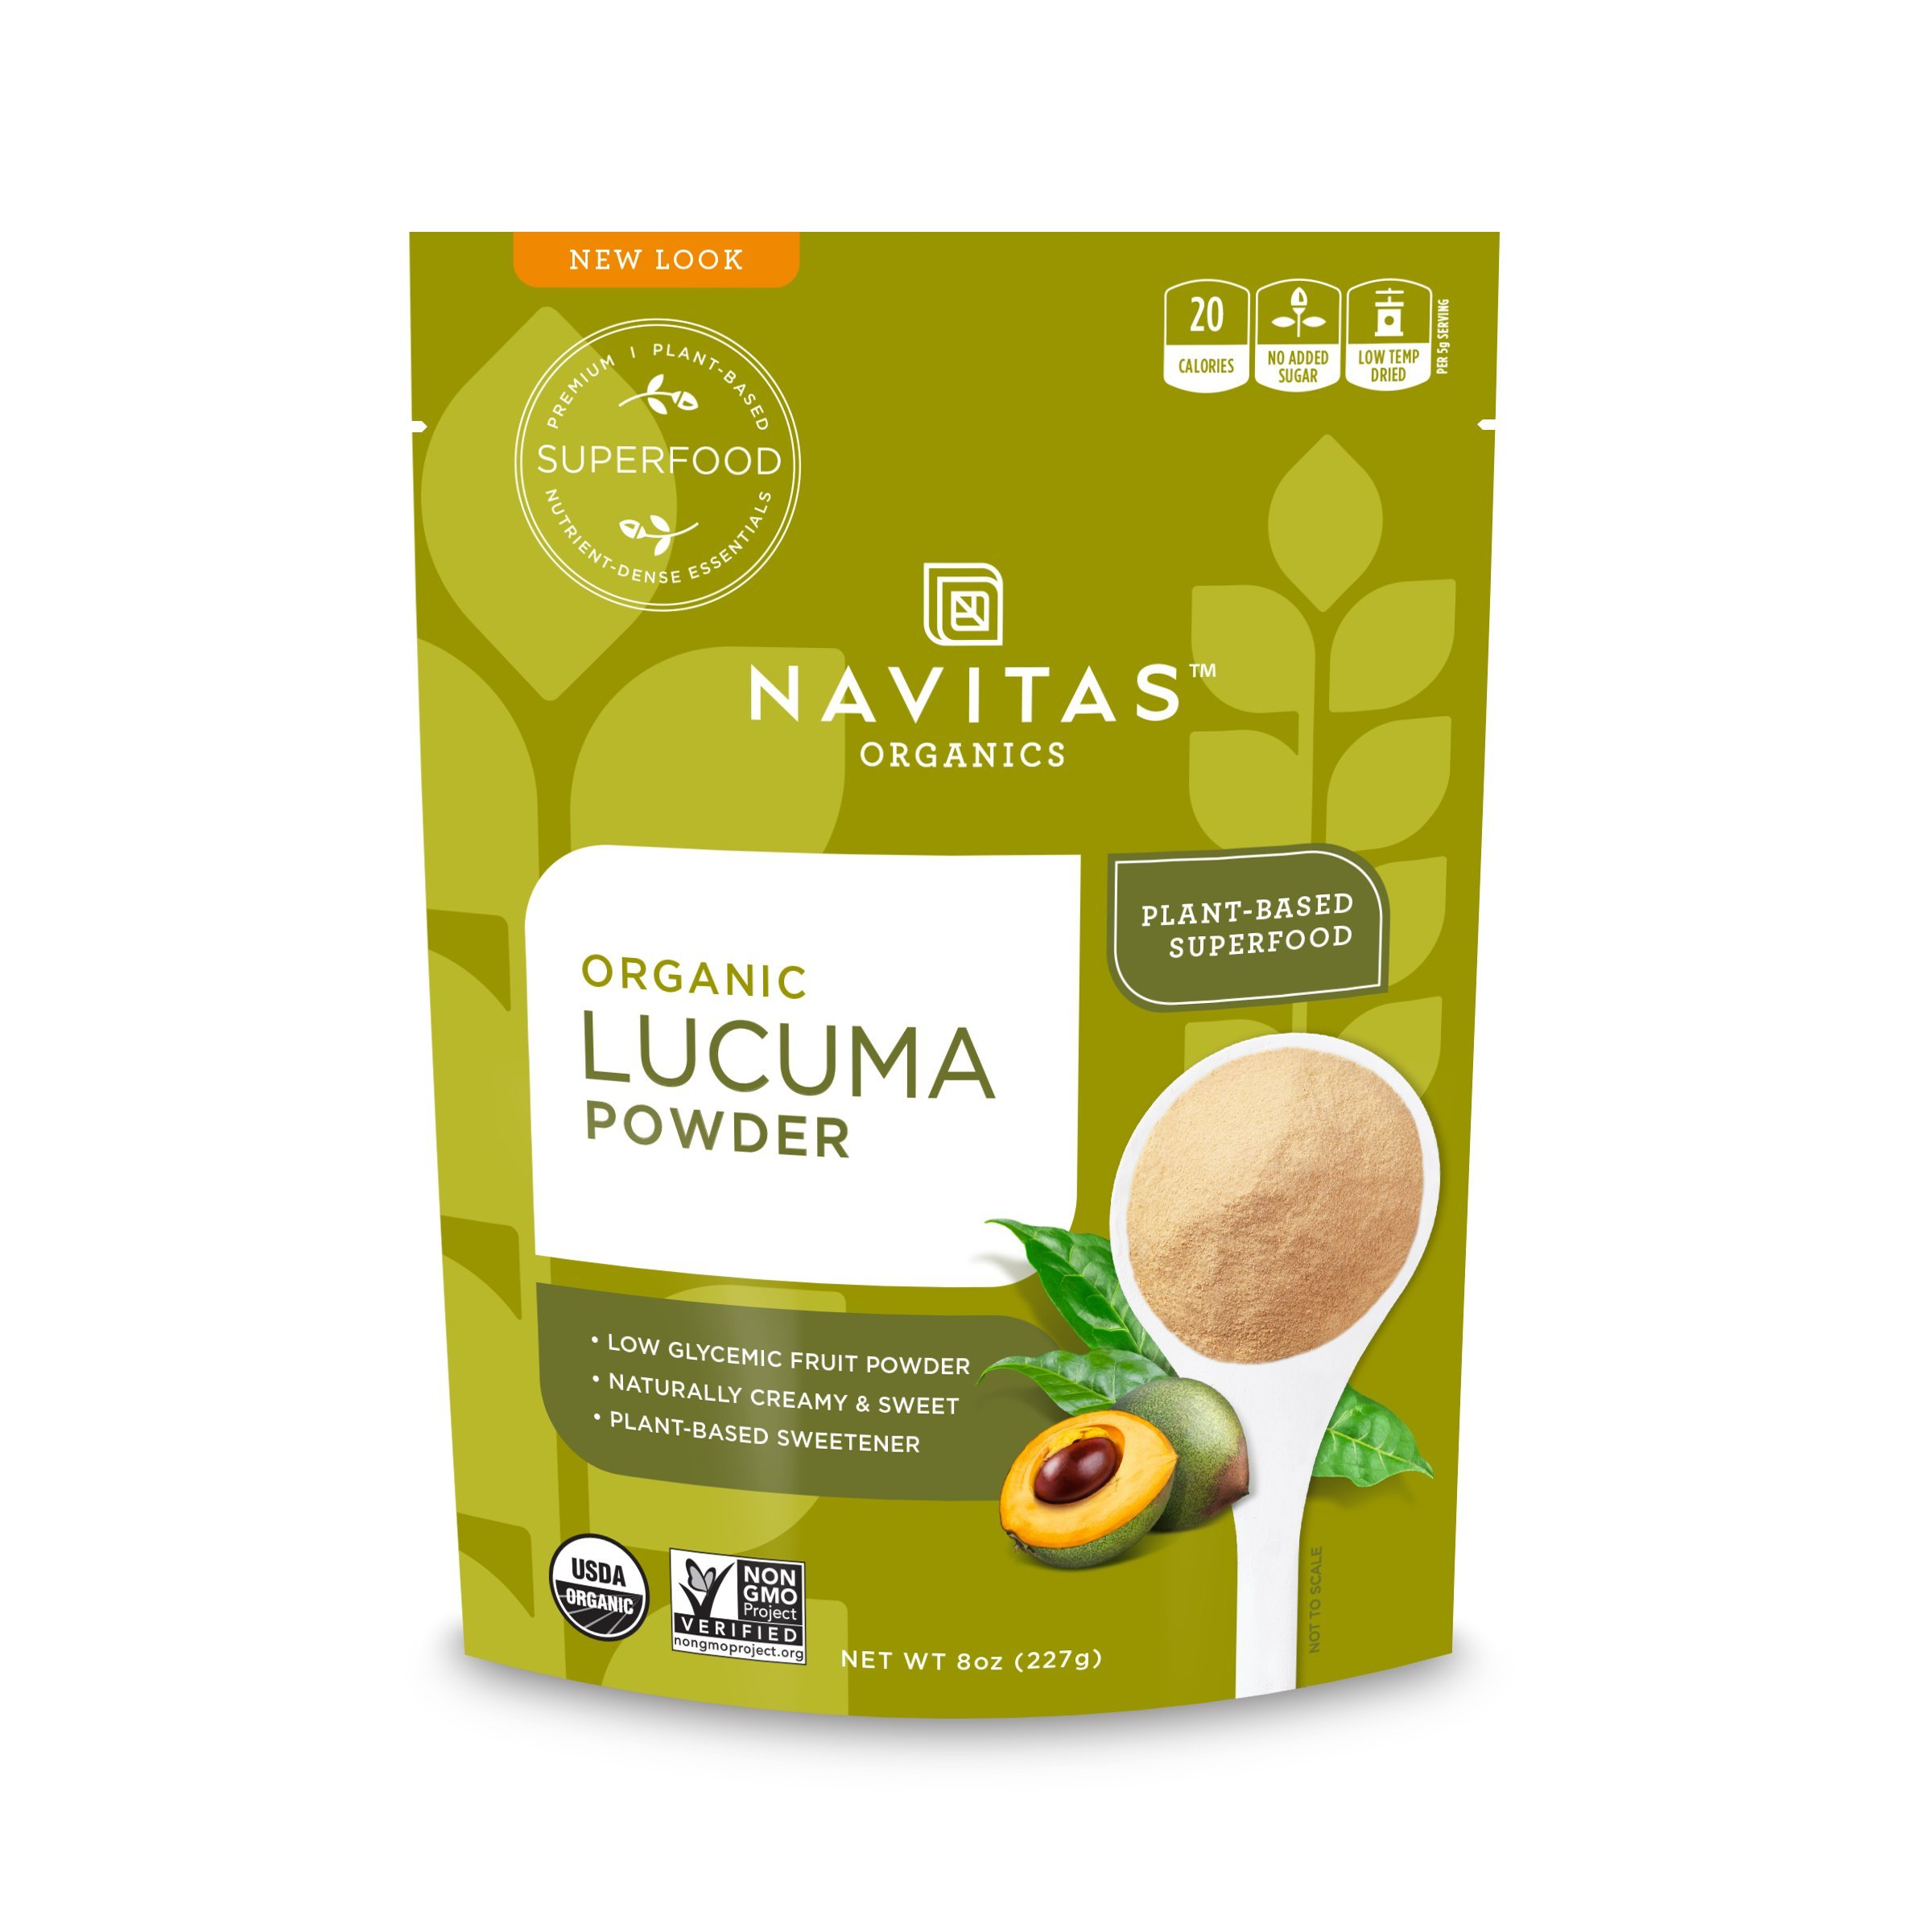 Navitas Organics Lucuma Powder, 8 oz. Bags (Pack of 2) - Organic, Non-GMO, Gluten-Free by Navitas Organics